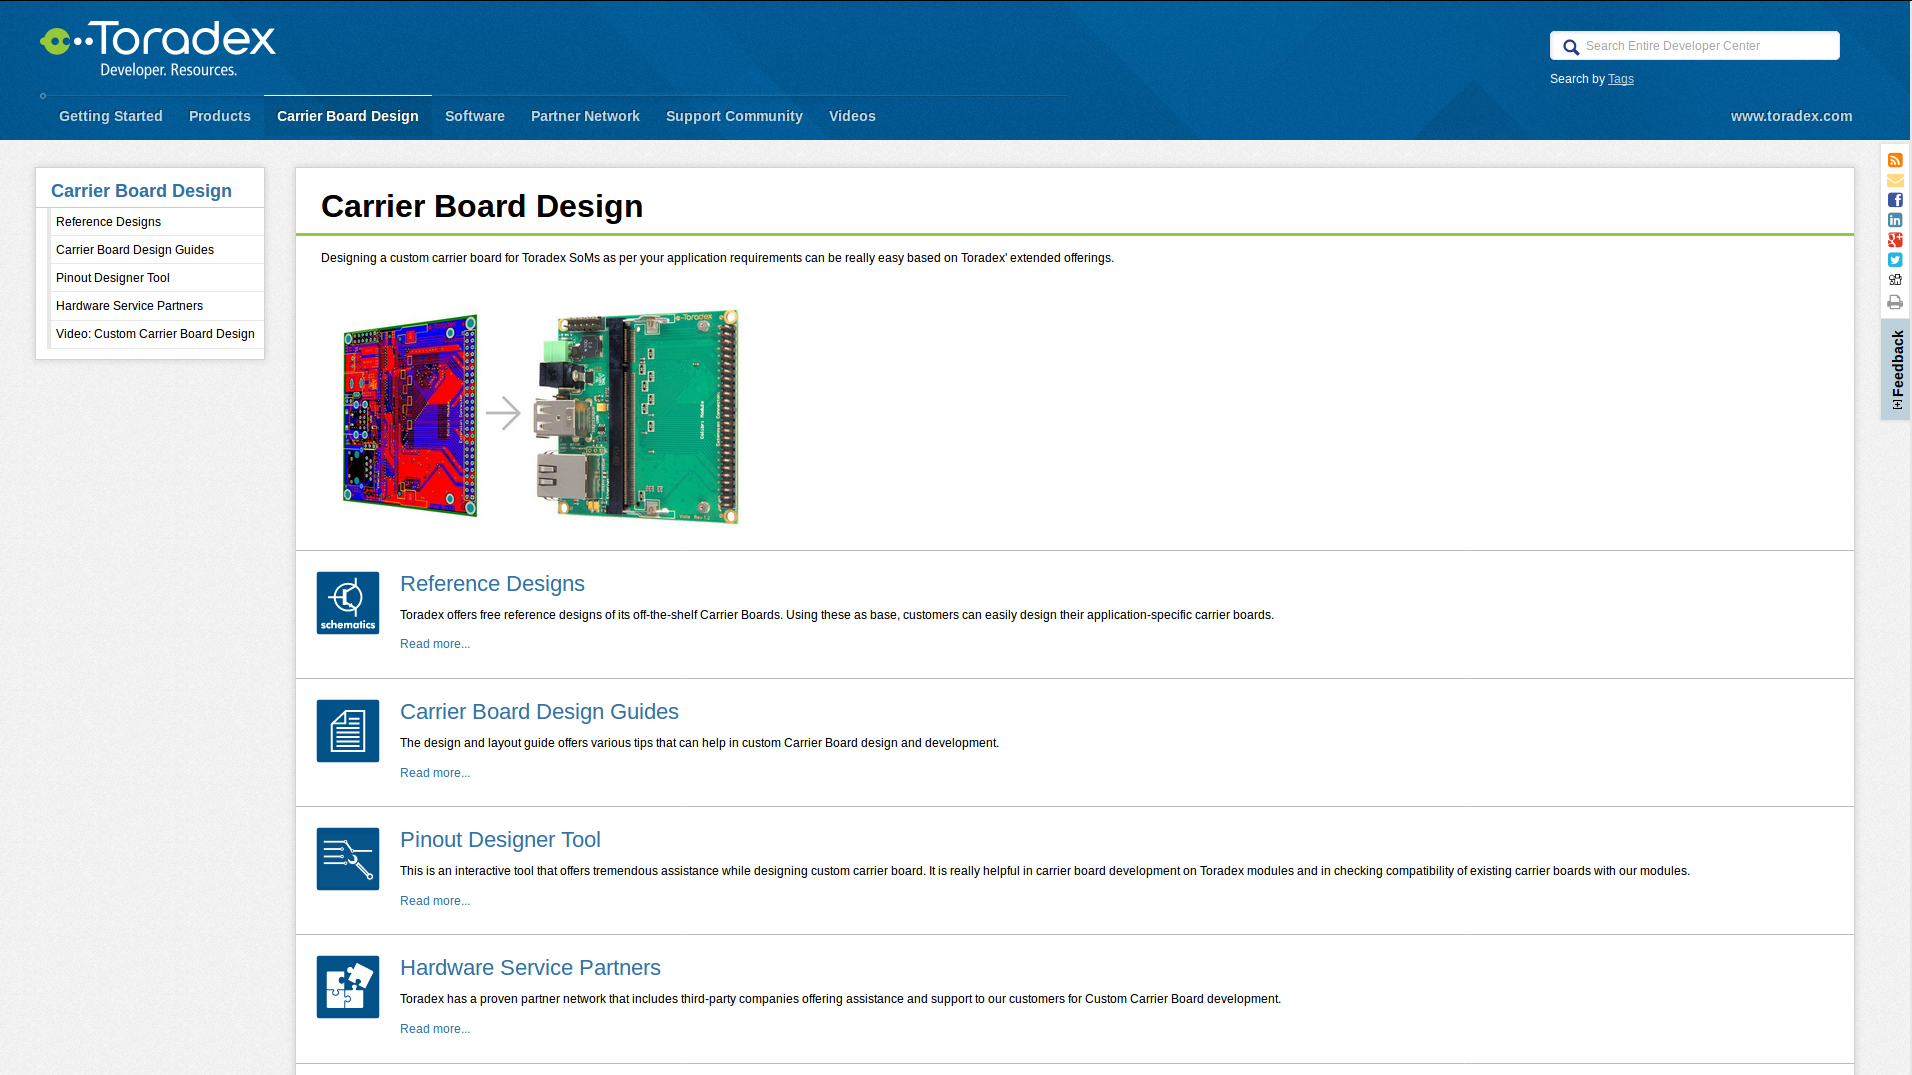 Carrier Board Design tab